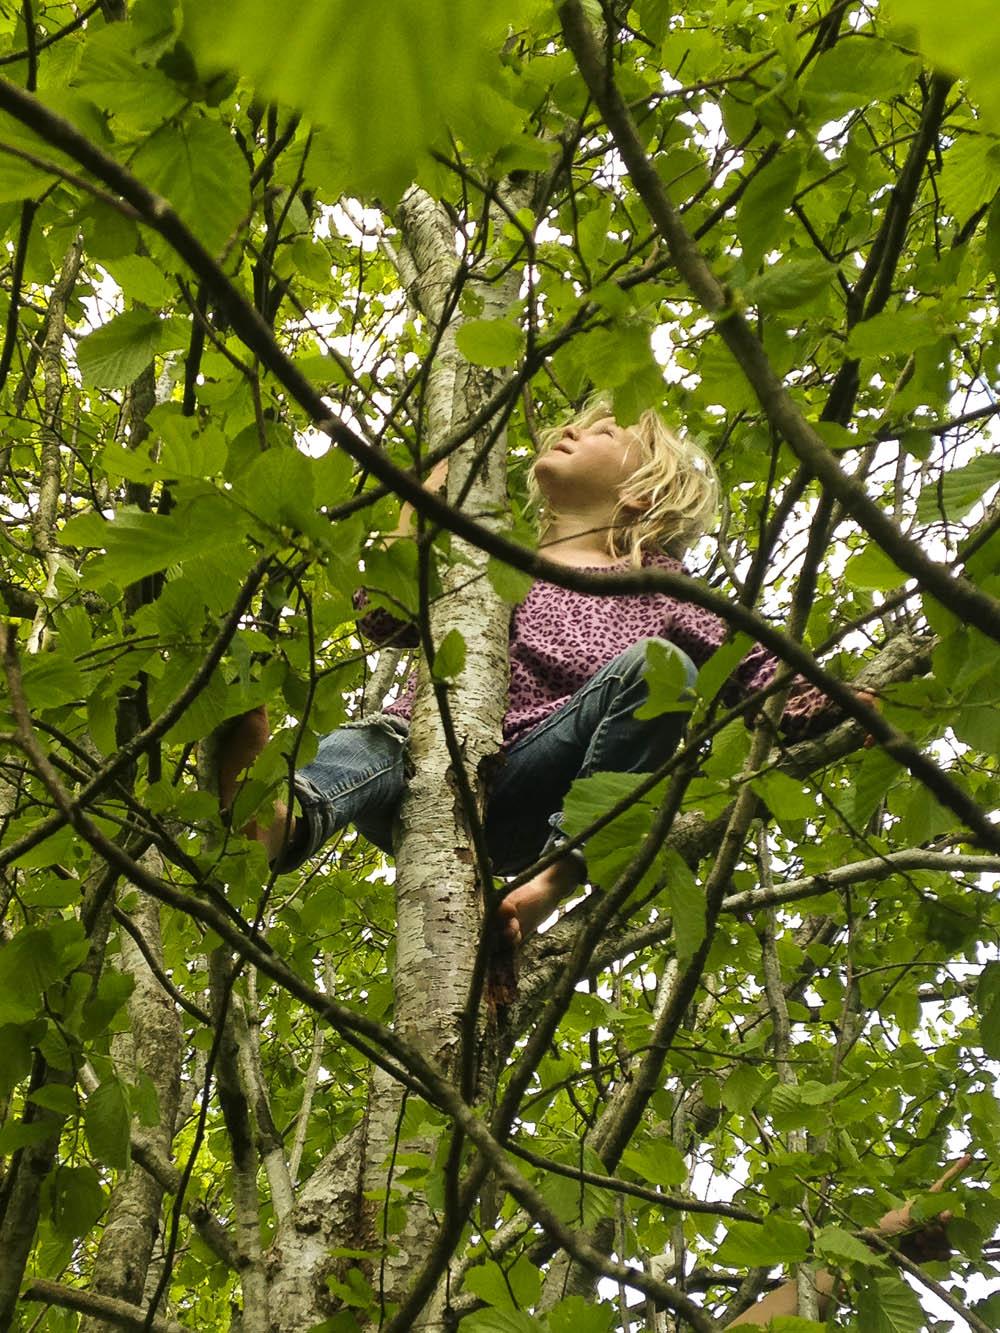 Why We Must Protect and Nurture Our Children's Sense of Wonder. Rain or Shine Mamma. #senseofwonder #nature #friluftsliv